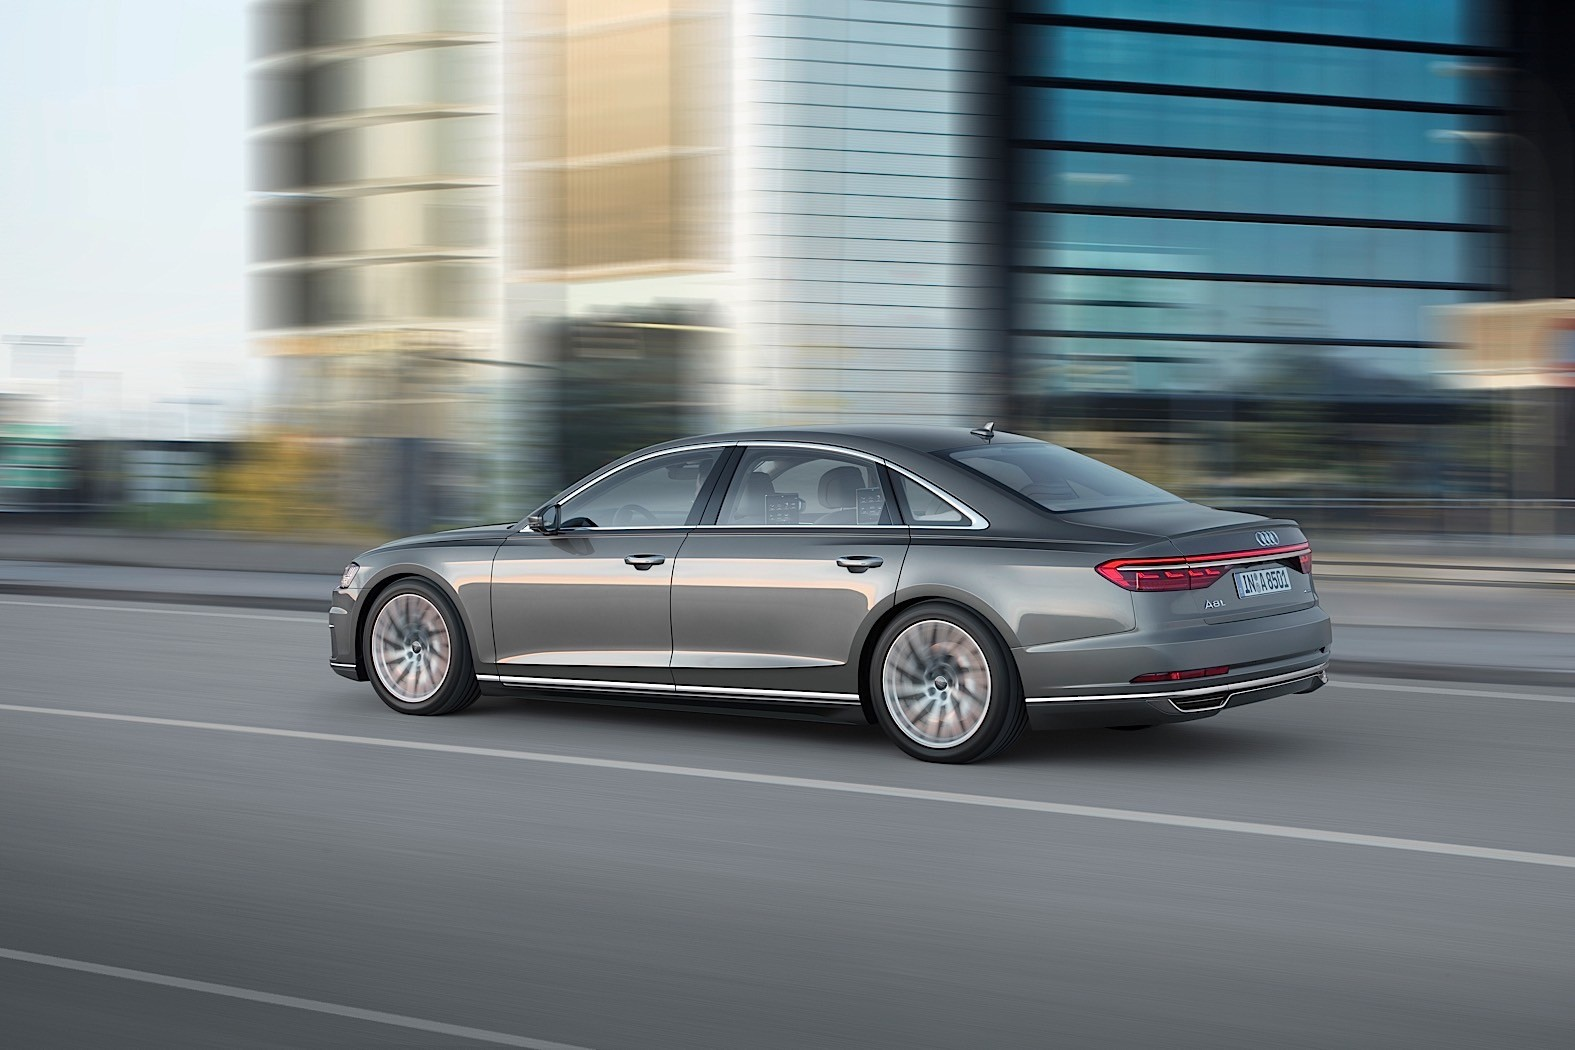 Audi A Floor Plans on audi cars, audi s7, audi a5, audi rs8, audi q7, audi custom, audi r5, audi r8, audi a10, audi interior, audi jeep, audi a7, audi s6, audi qs5, audi s8, audi fox, audi supercar, audi models, audi a3,